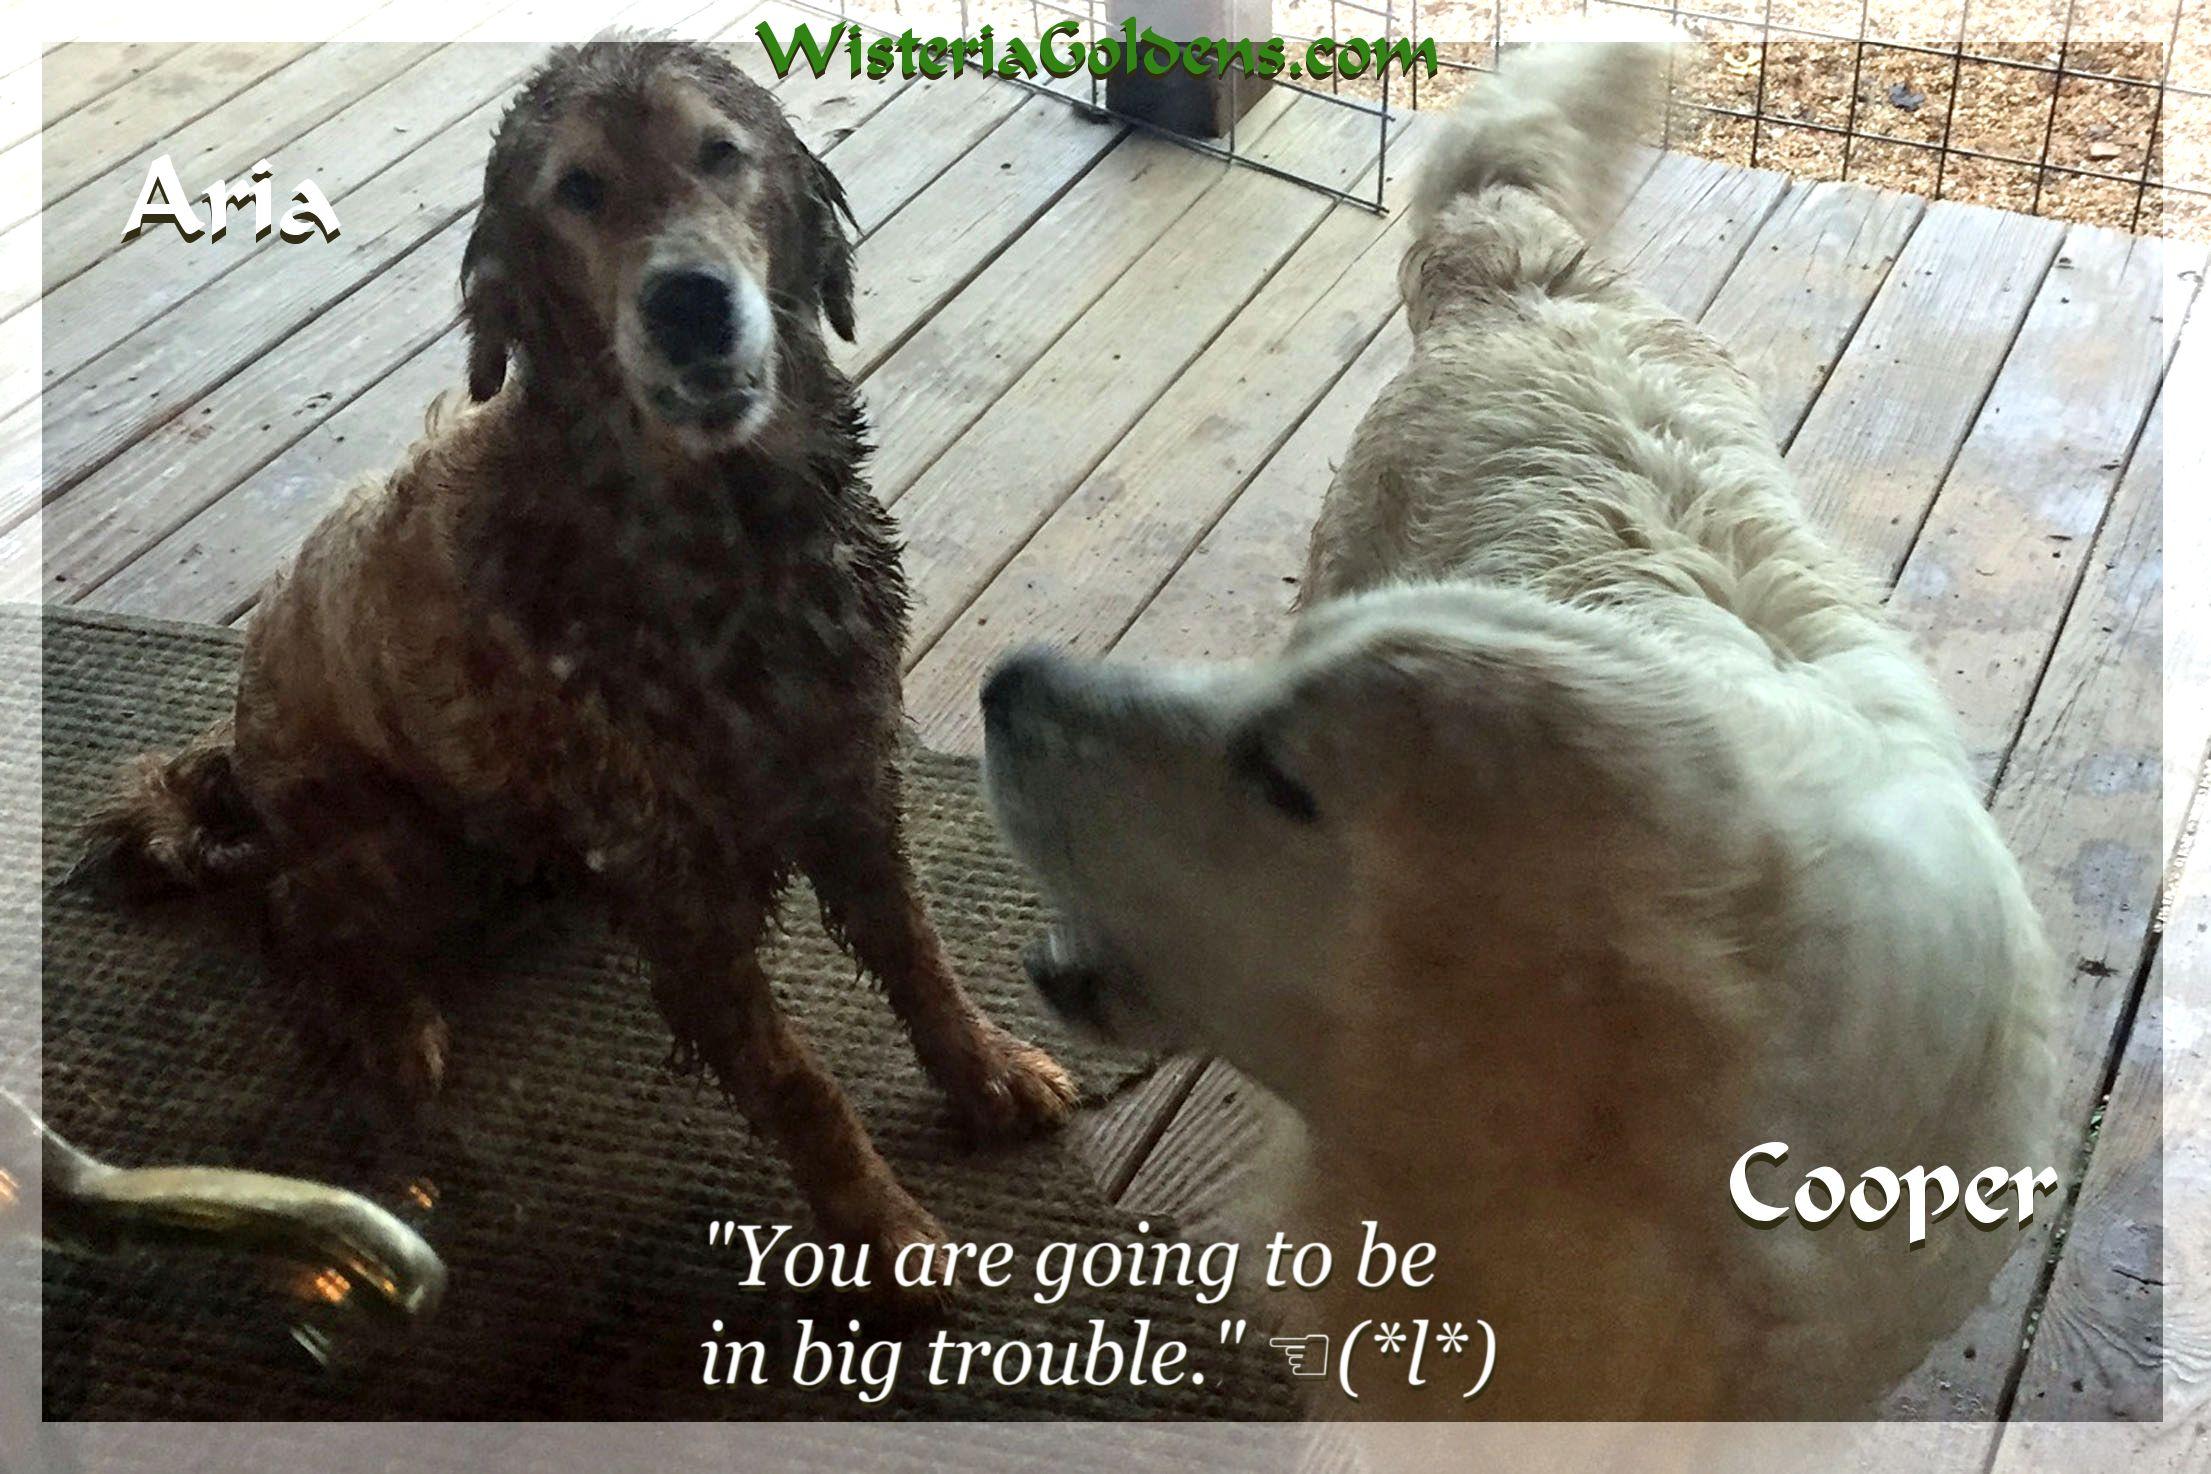 Golden Retriever Puppies Goldenretrieveroftheday Goldenretrieverlife Puppies Cute Puppies Puppy Dog Eyes